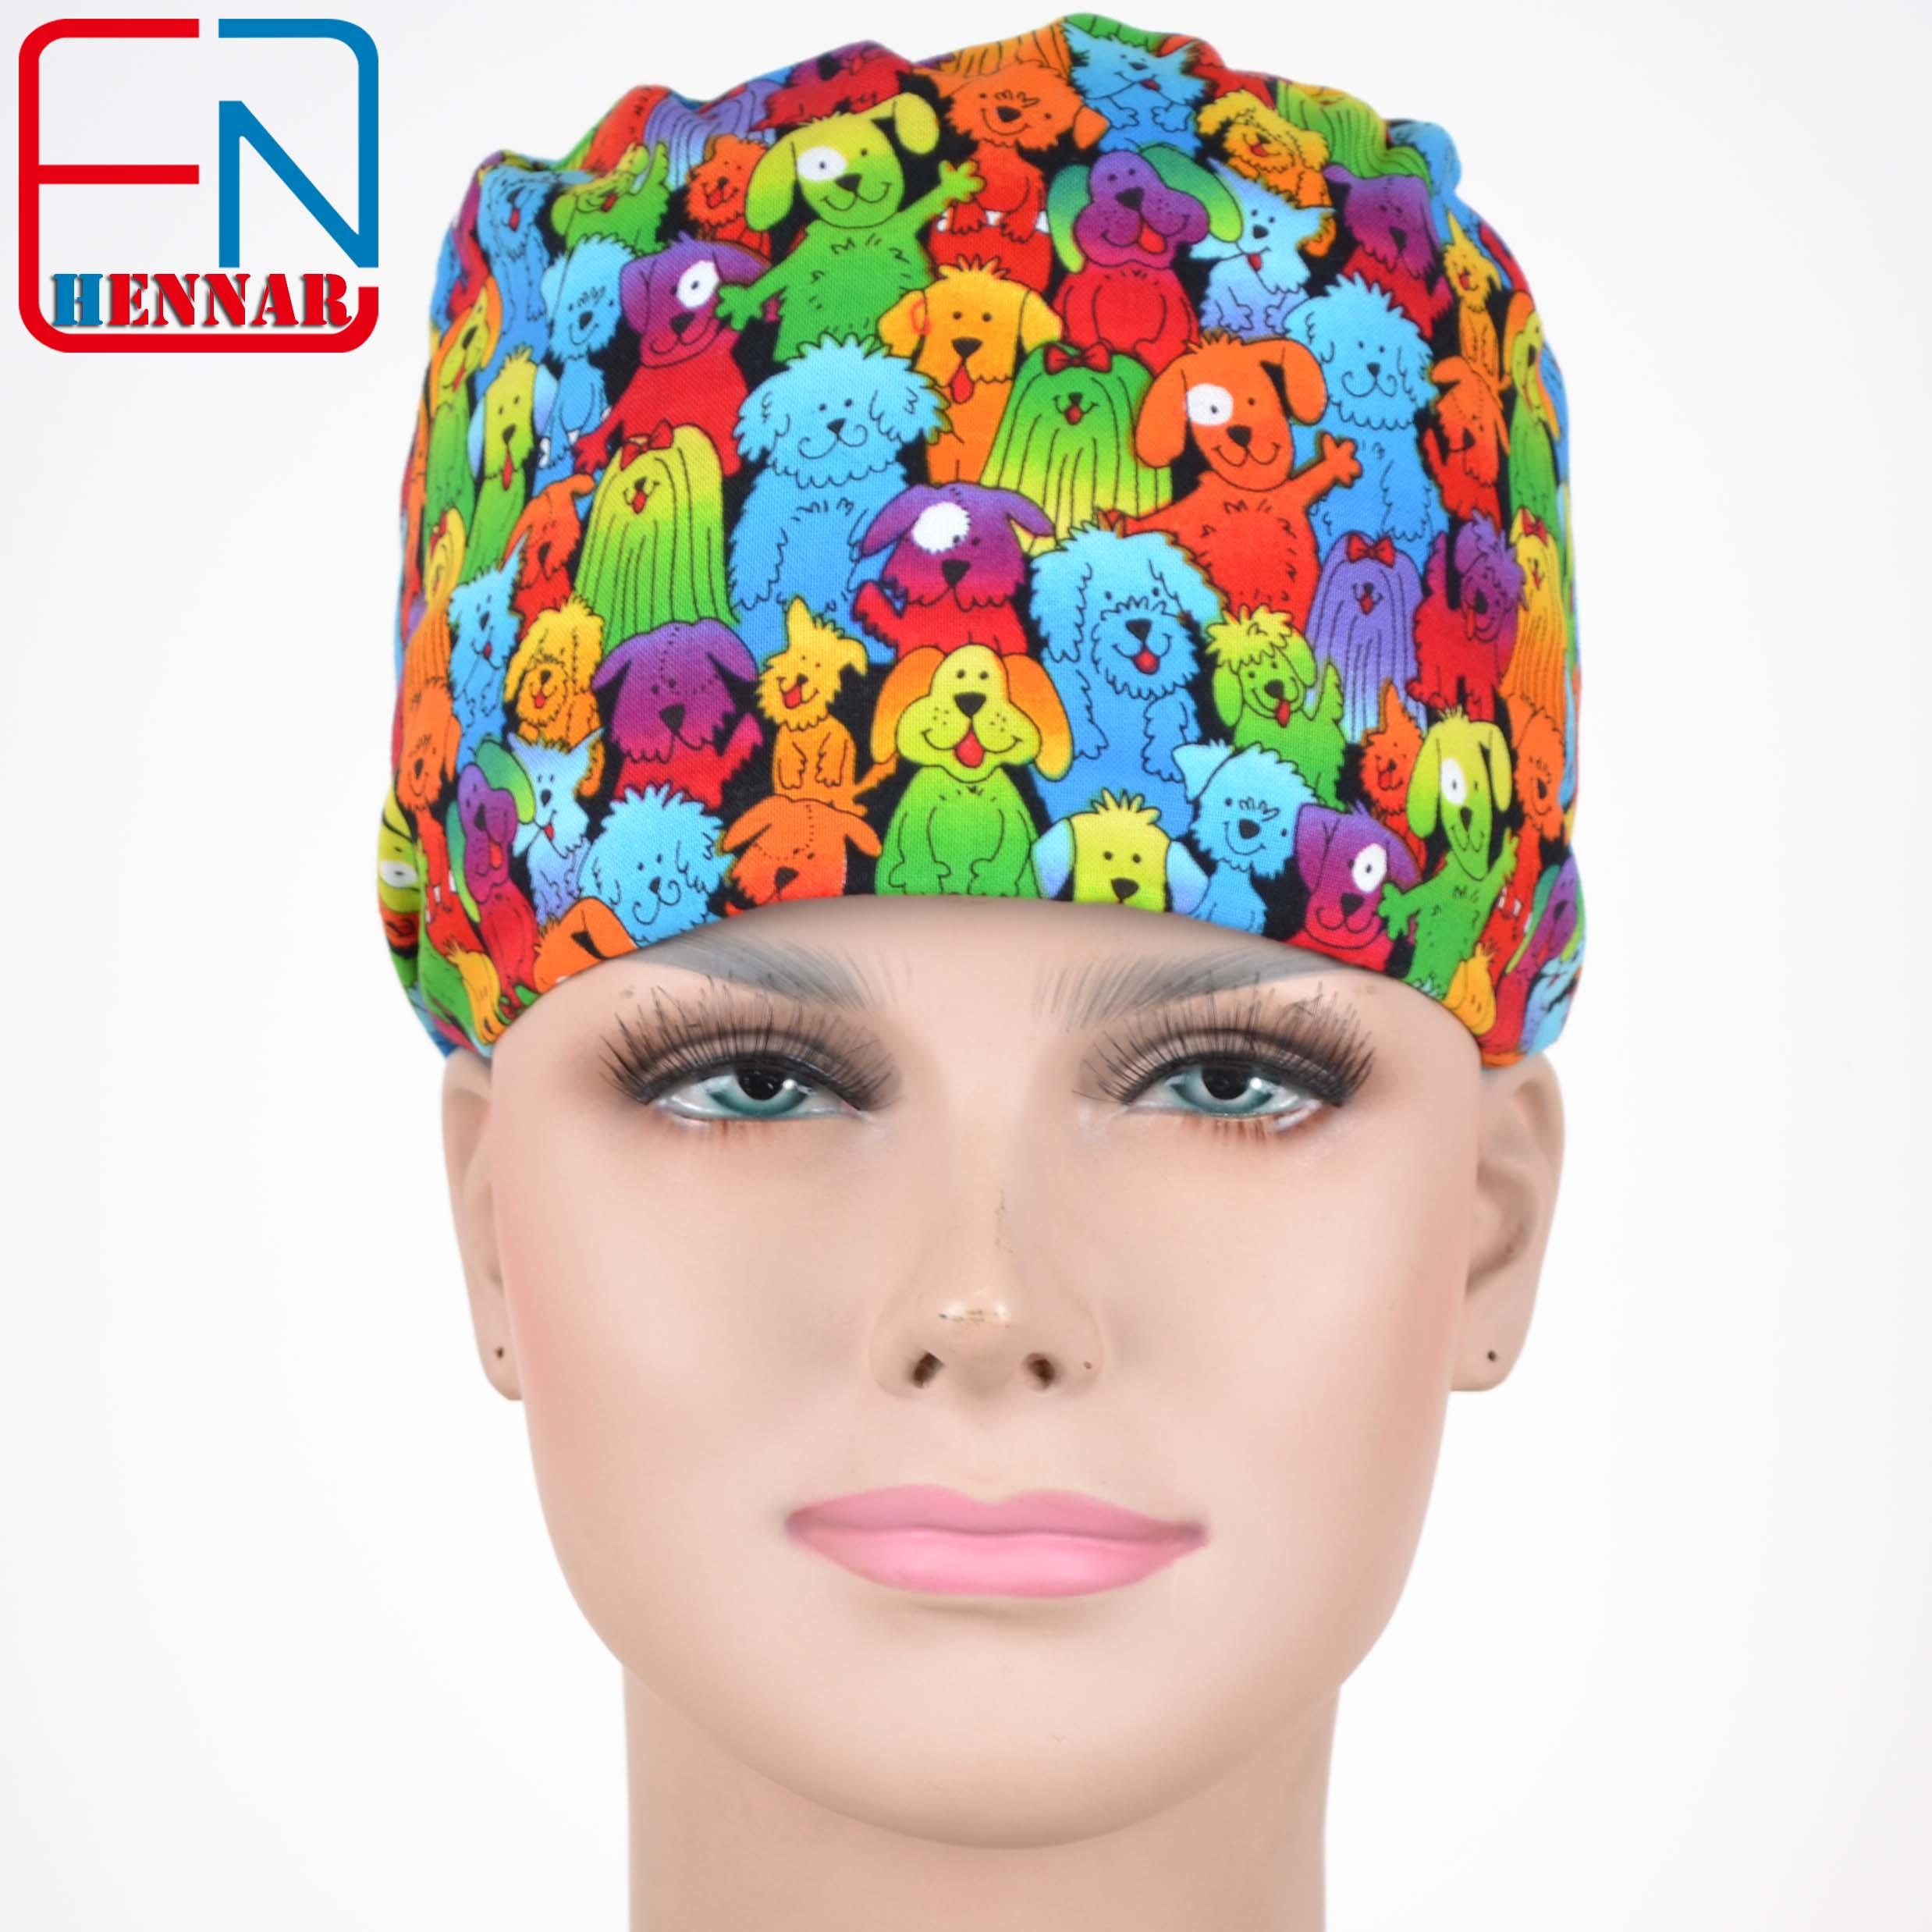 Hennar  Scrub Caps Masks 100% Cotton Adjustable Elastic Bands Surgical Scrub Caps Medical Hospital Doctor Headwear Cap Mask